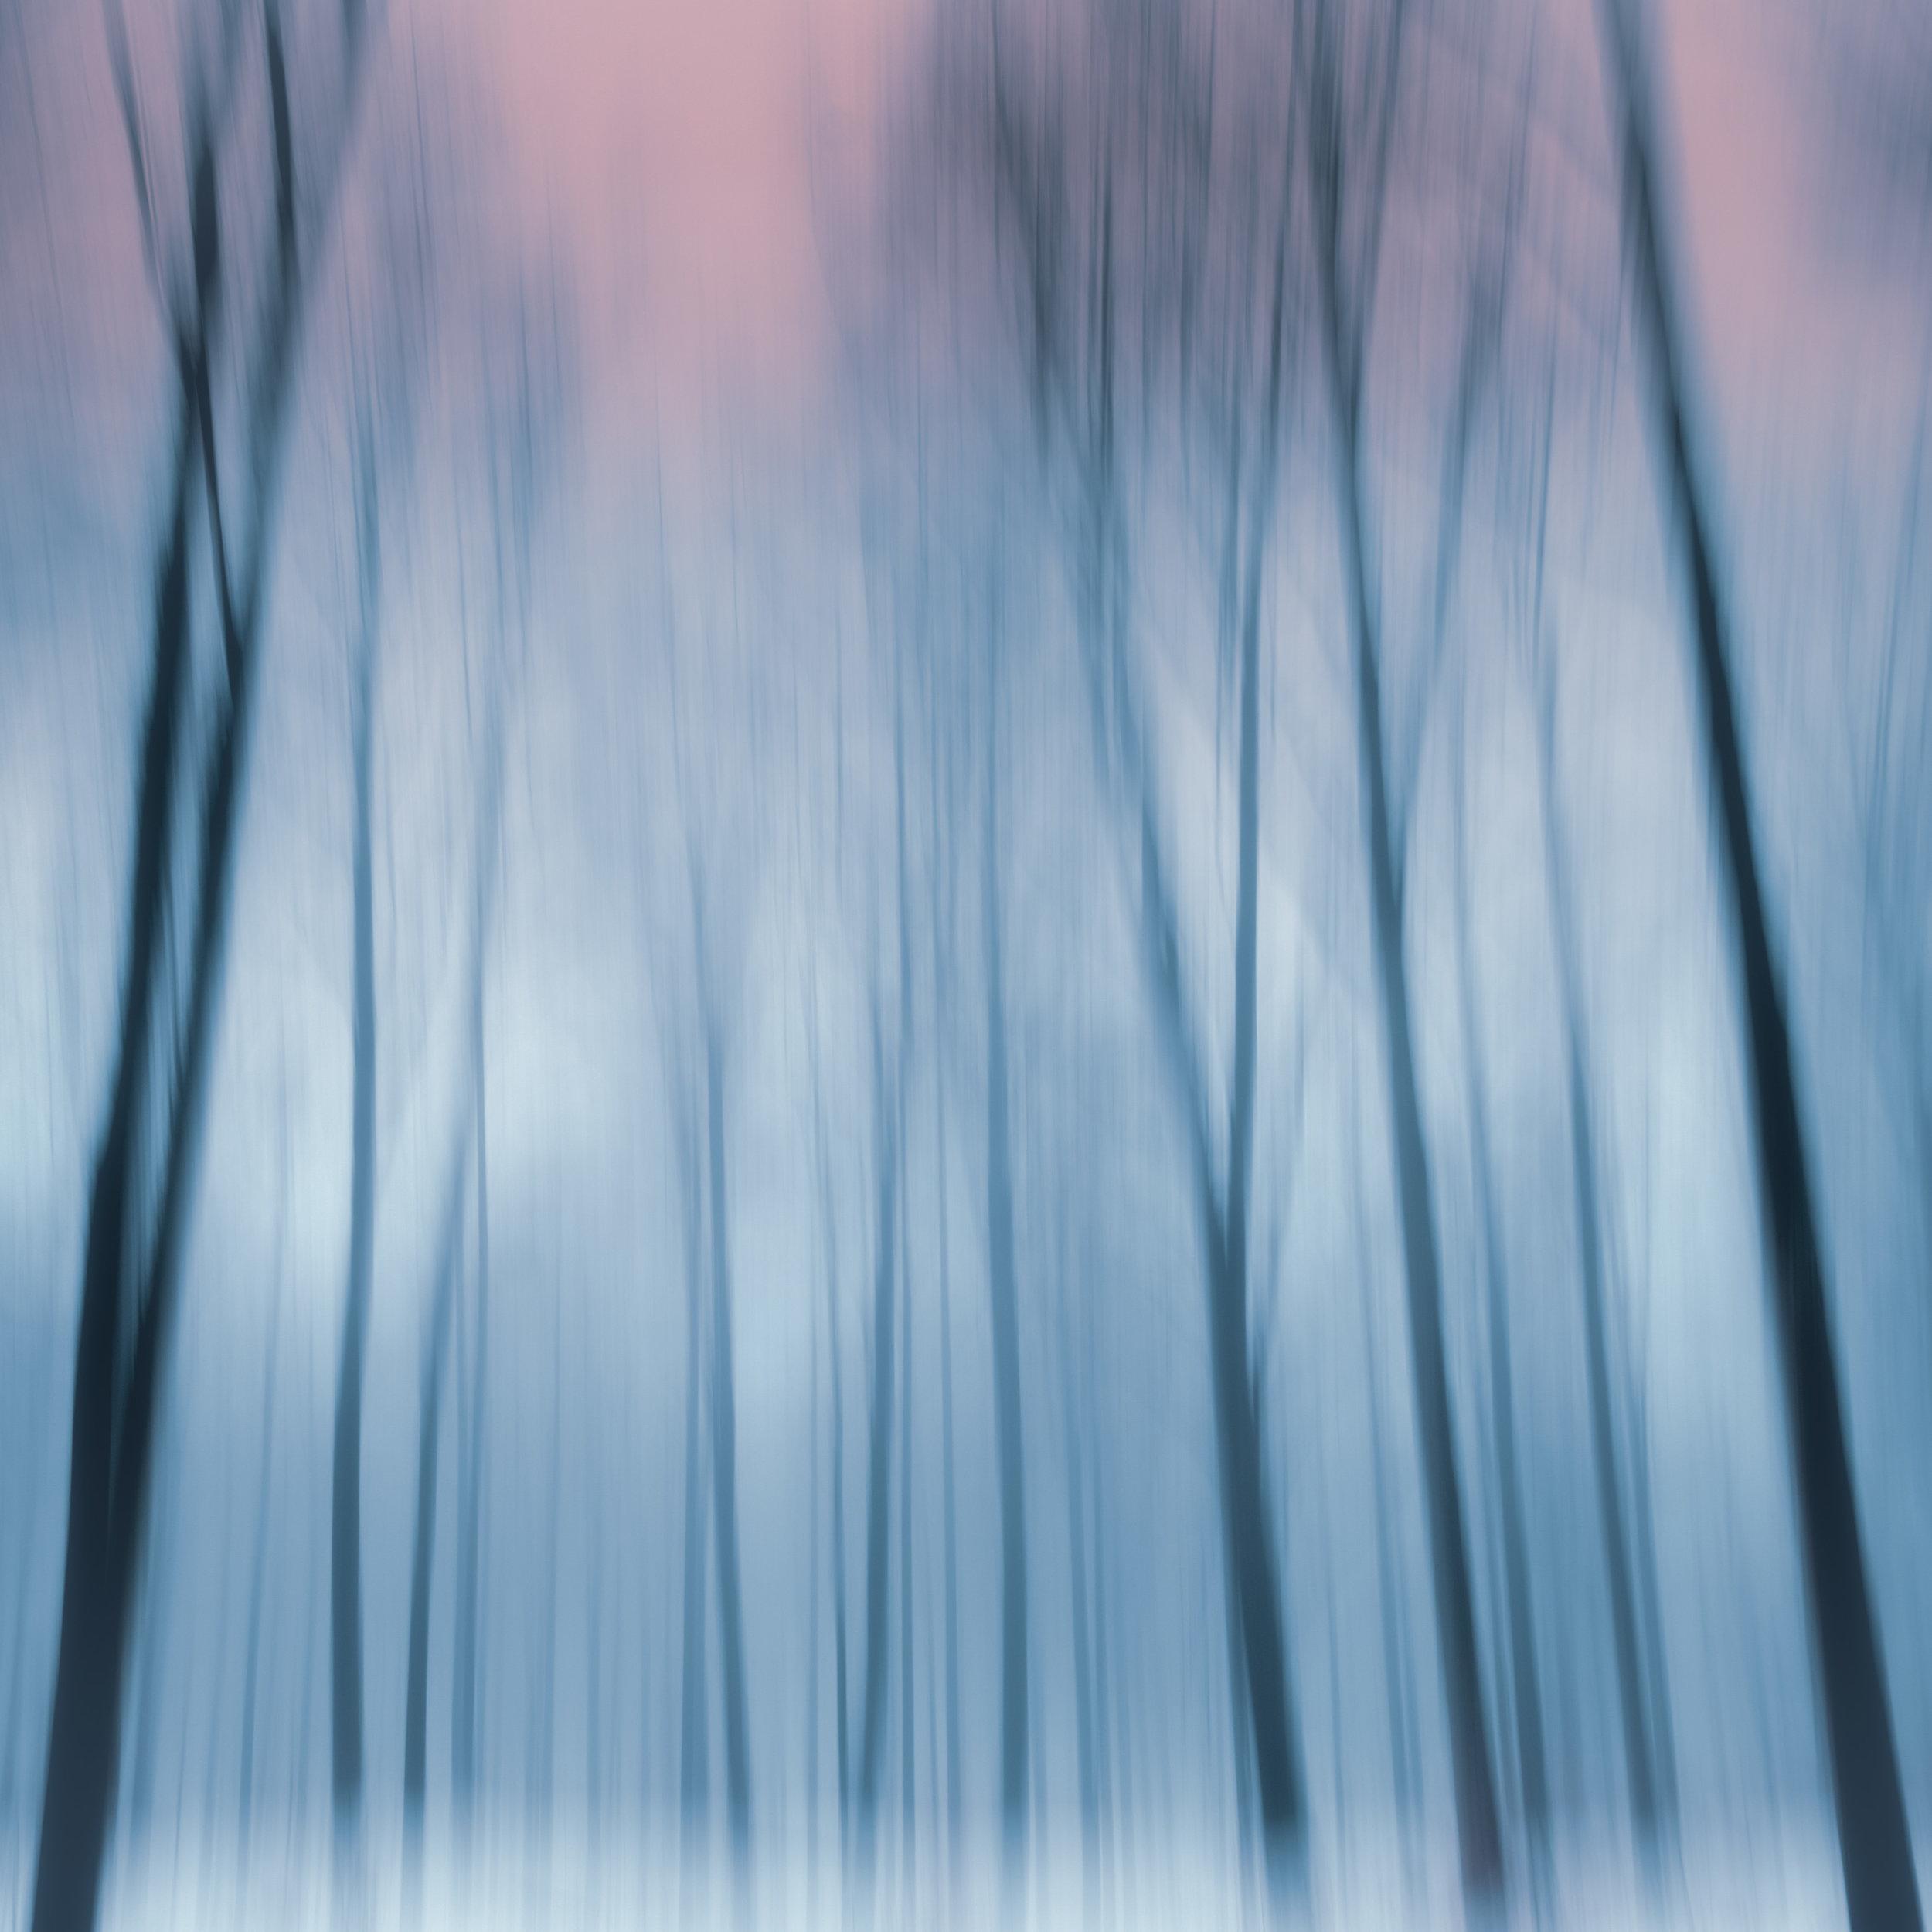 trees ecm 1 (1 of 1).jpg